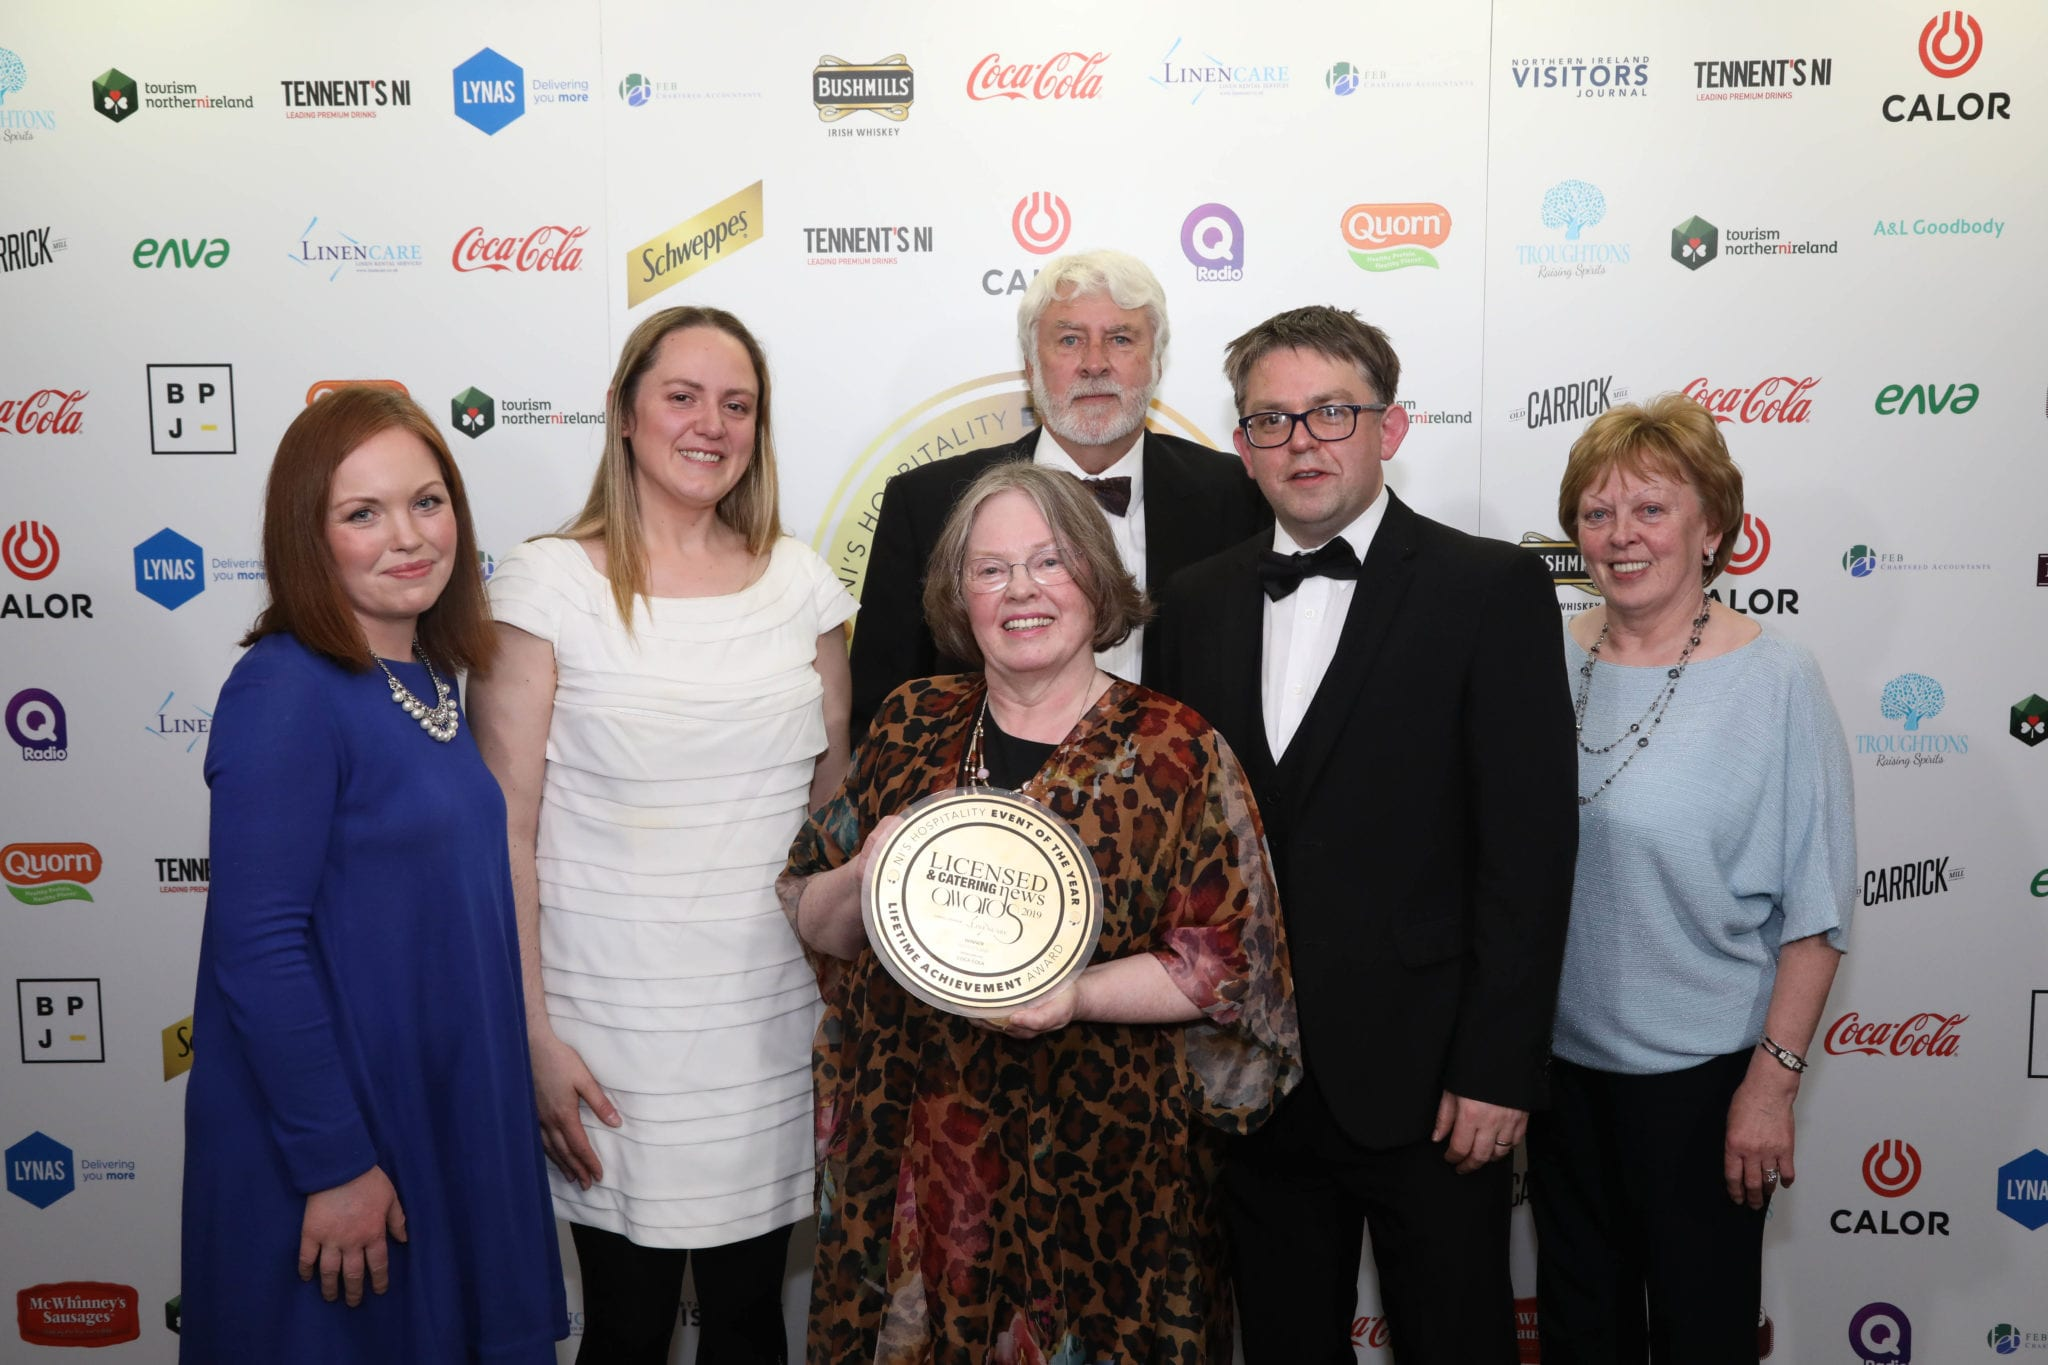 Hotelier Patsy honoured at glittering LCN Awards night